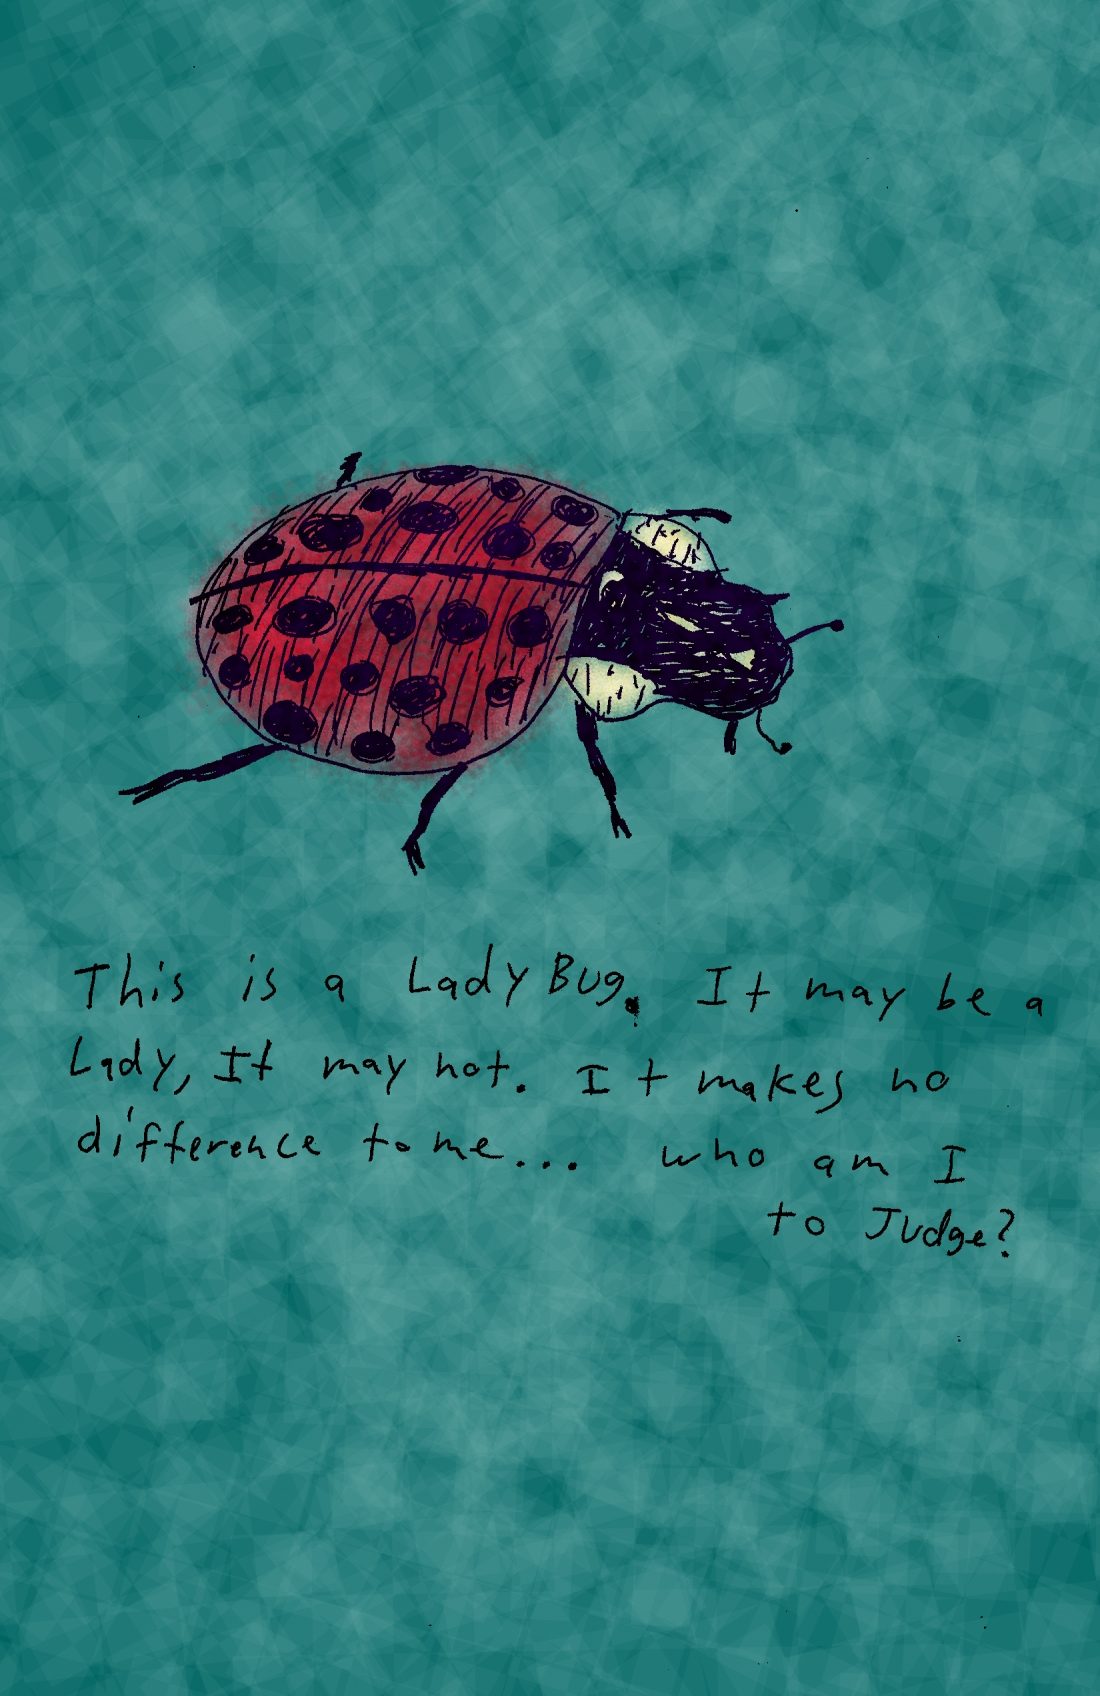 bugs pg 12 c